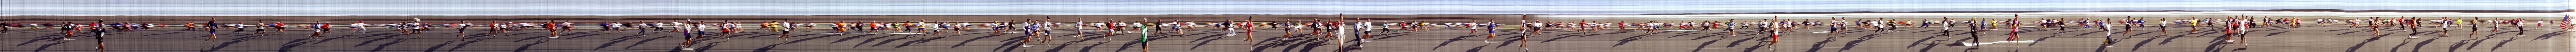 marathon_03.jpg